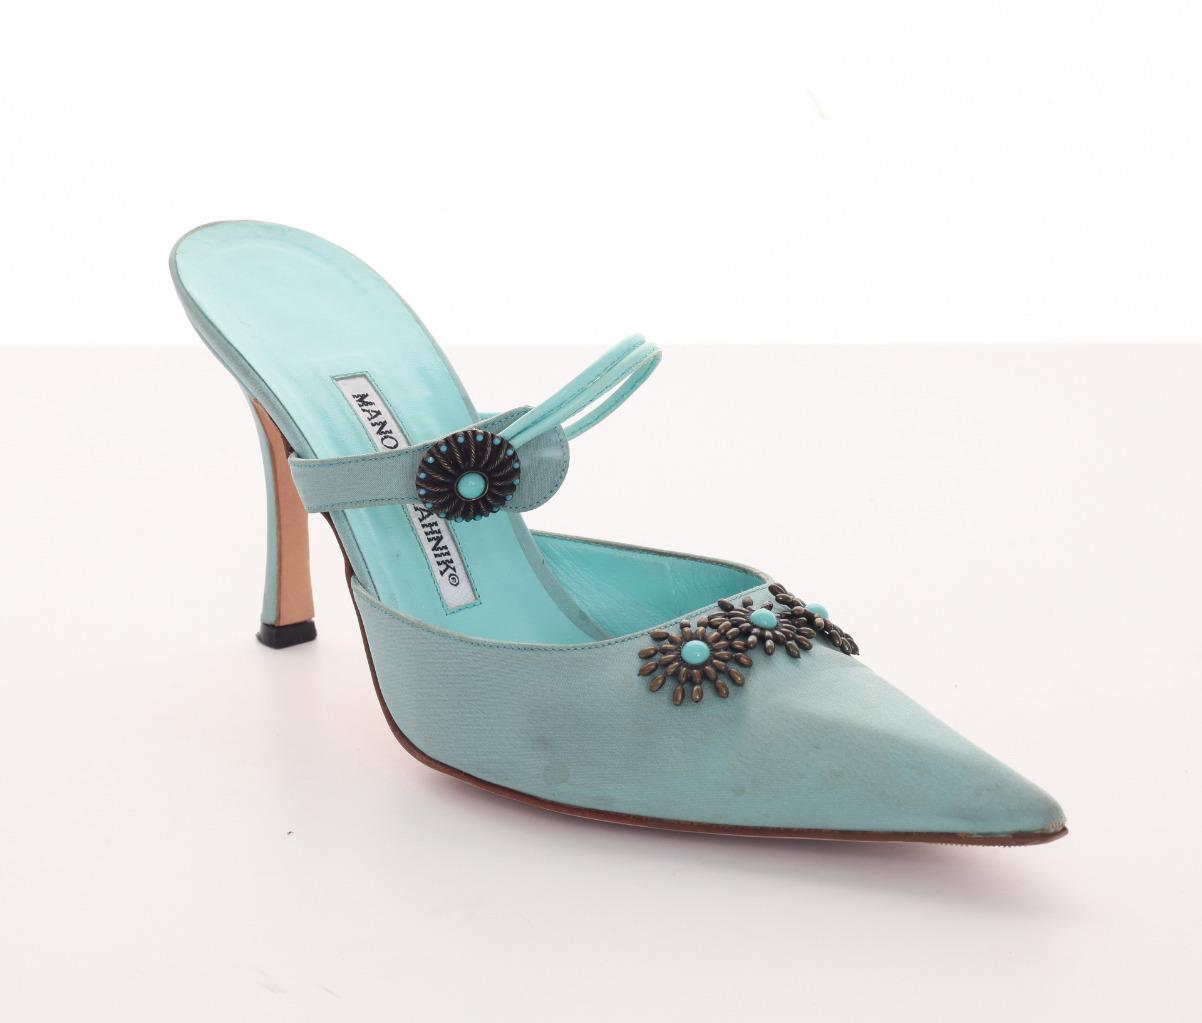 MANOLO MANOLO MANOLO BLAHNIK femmes Seafoam-bleu Embellished Pointed-Toe Mule High-Heels 10-40 bb65c0